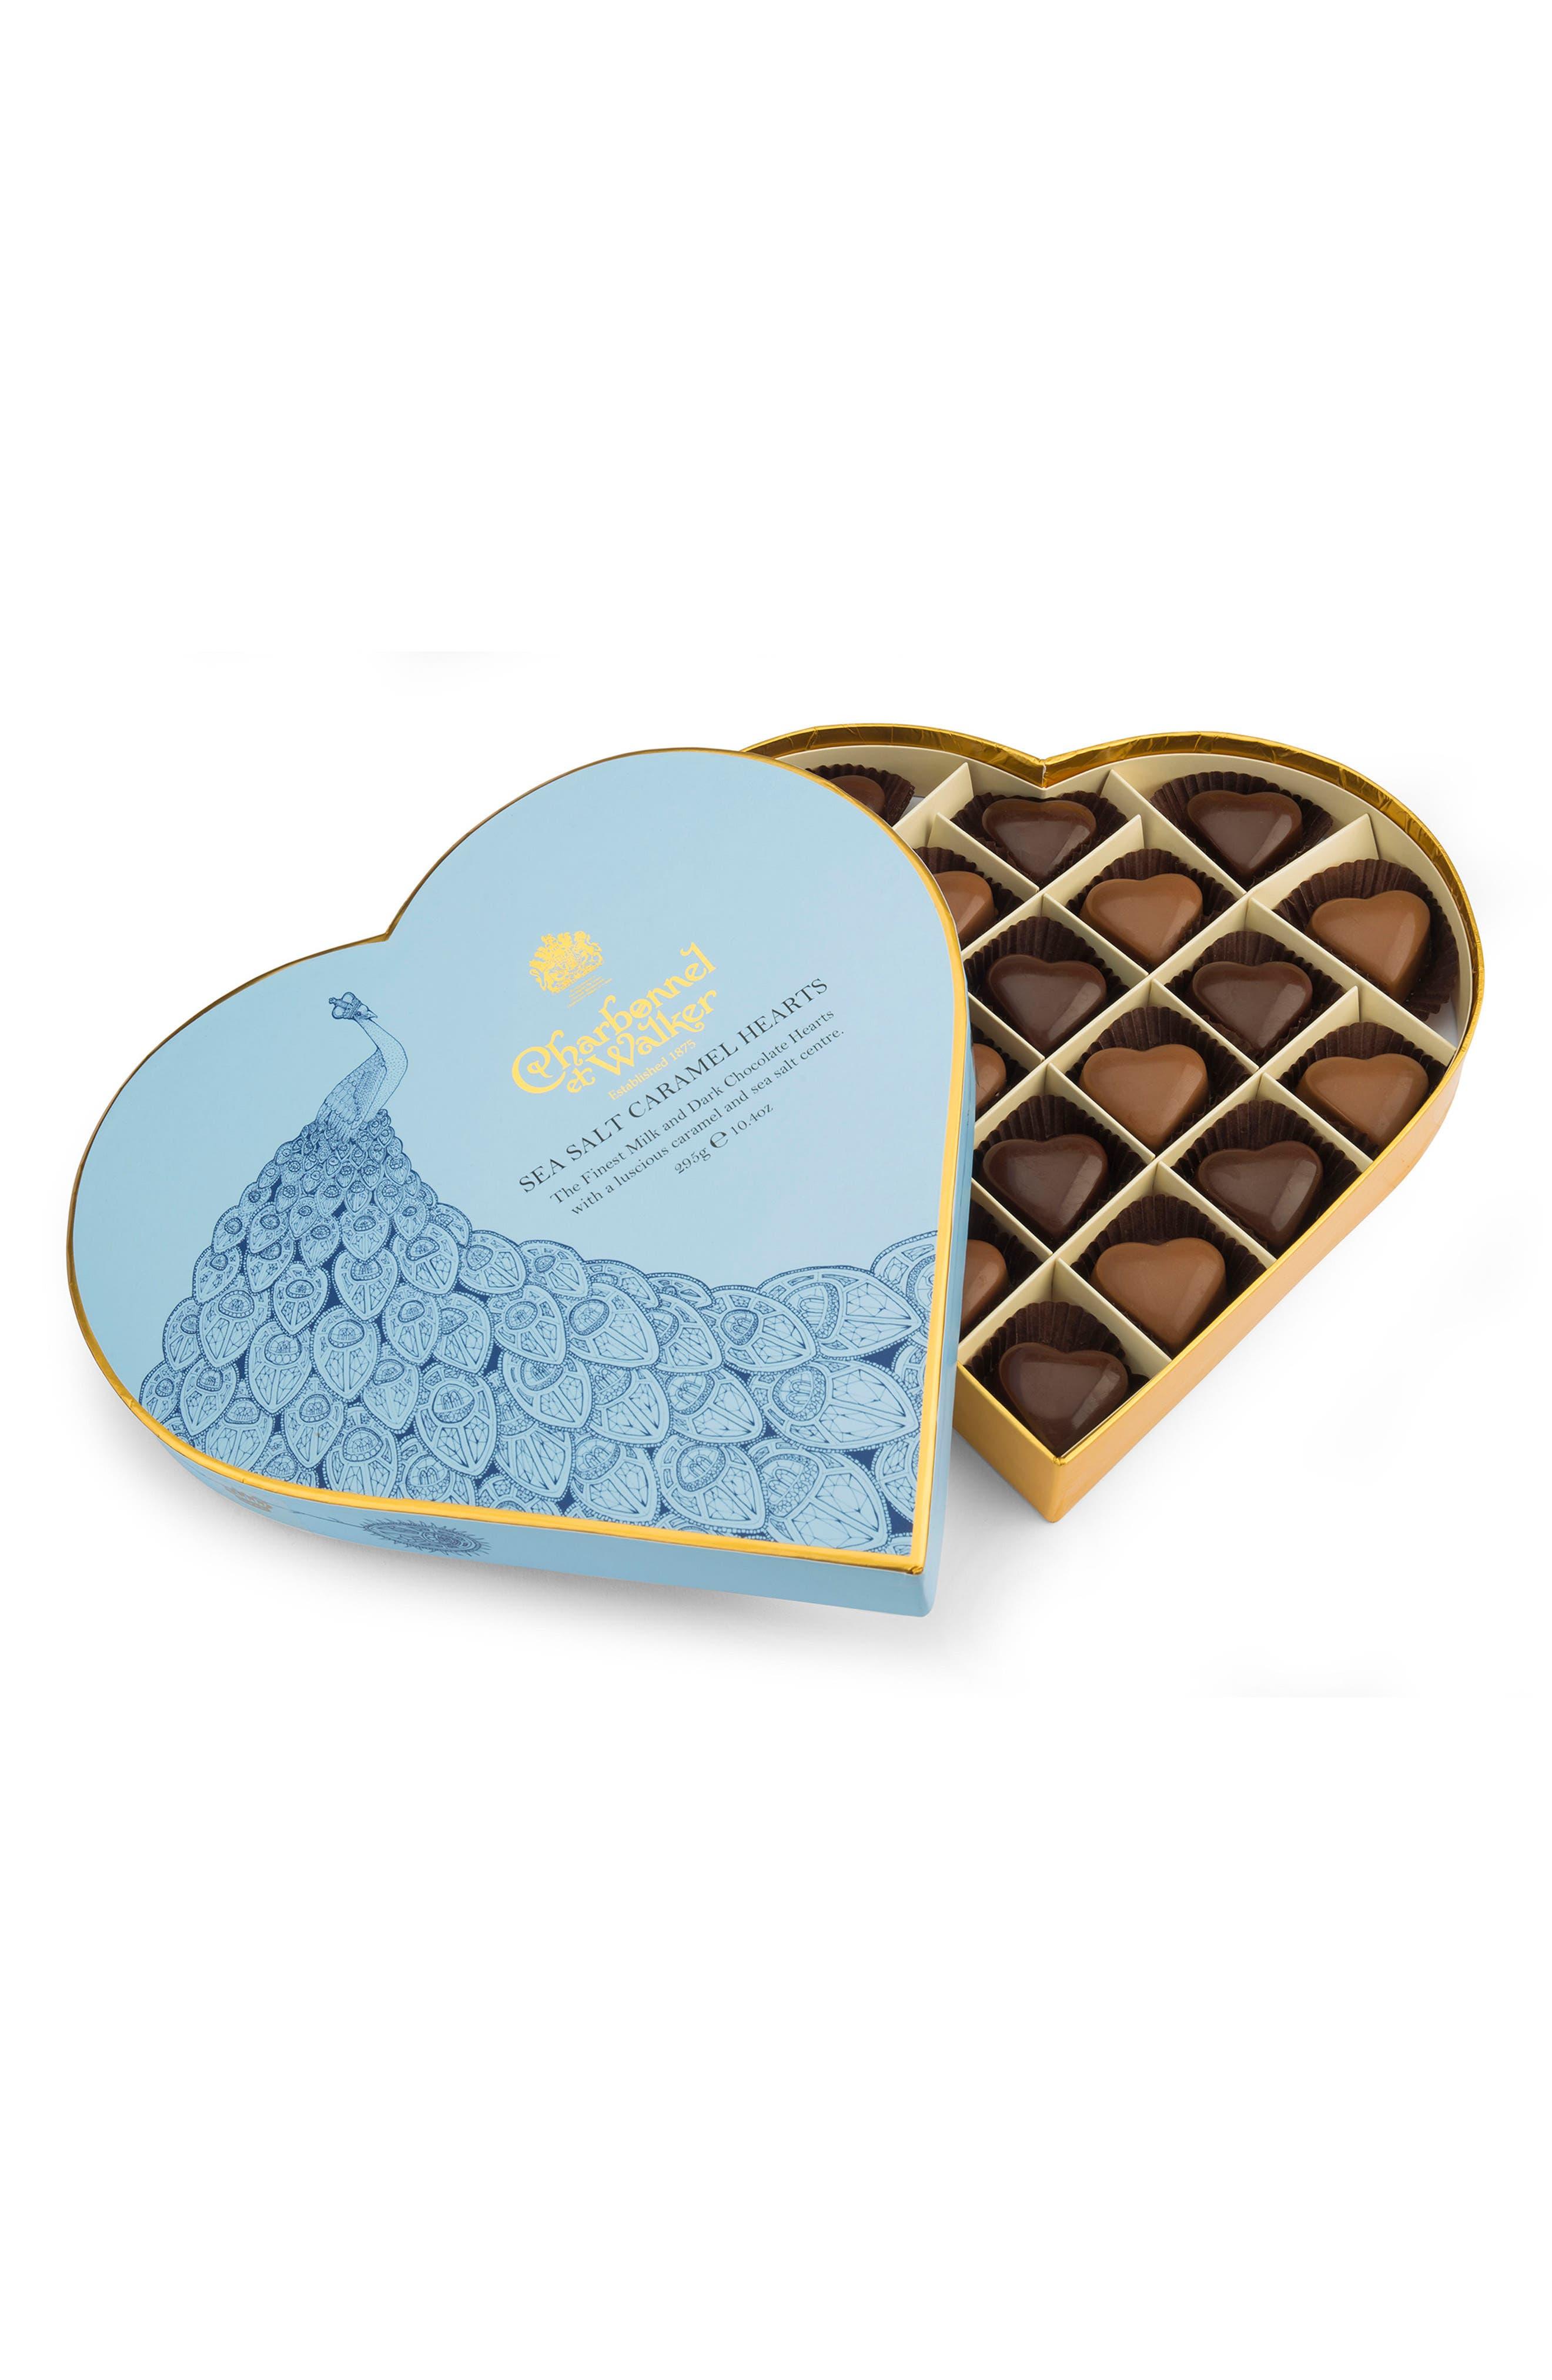 Sea Salt Caramel Chocolates in Heart Shaped Gift Box,                             Main thumbnail 1, color,                             Blue